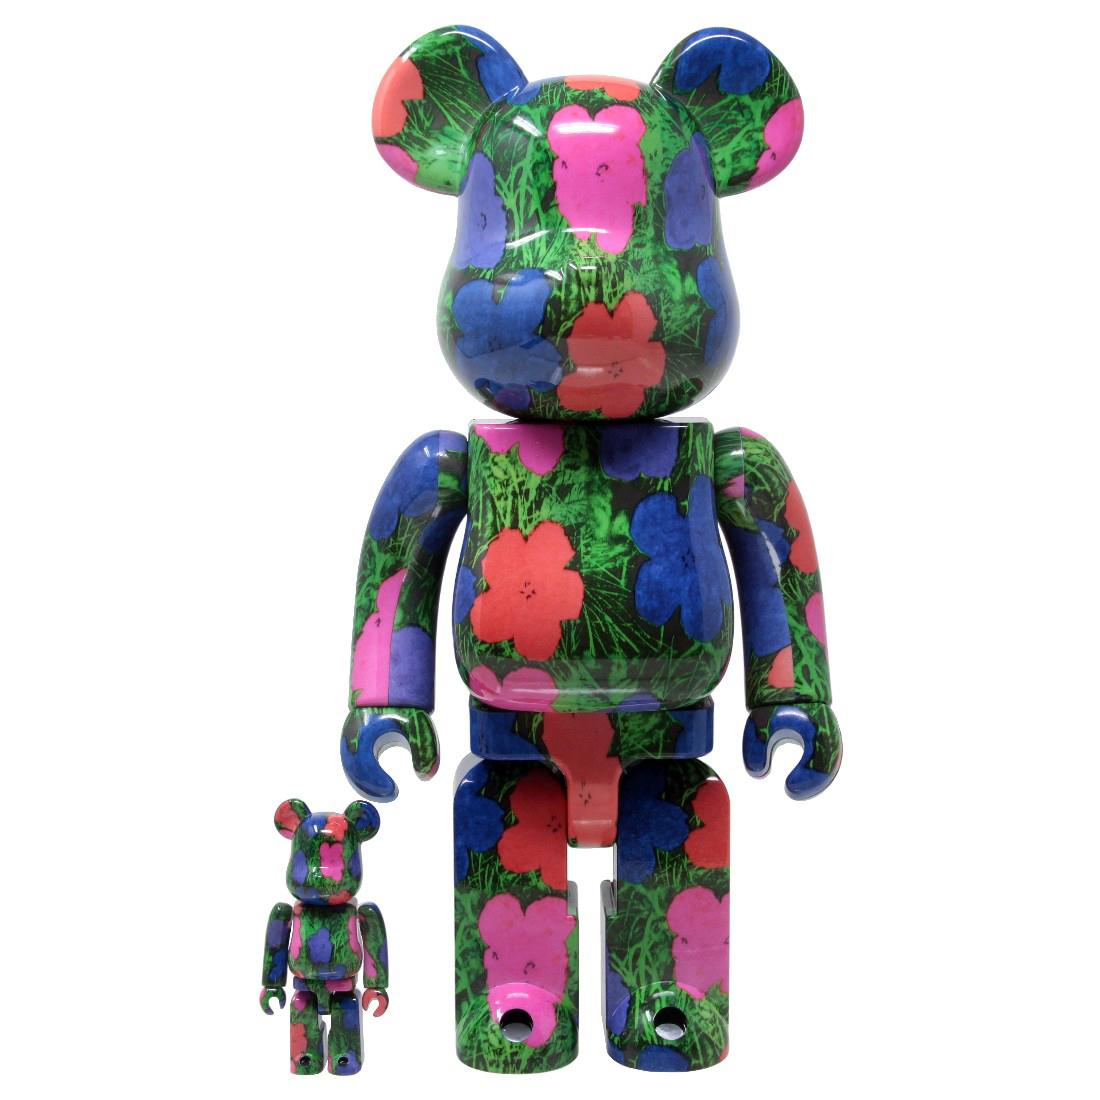 BEARBRICK ANDY WARHOL FLOWERS 400% & 100% Medicom Toy Japan Vinyl figure POP ART